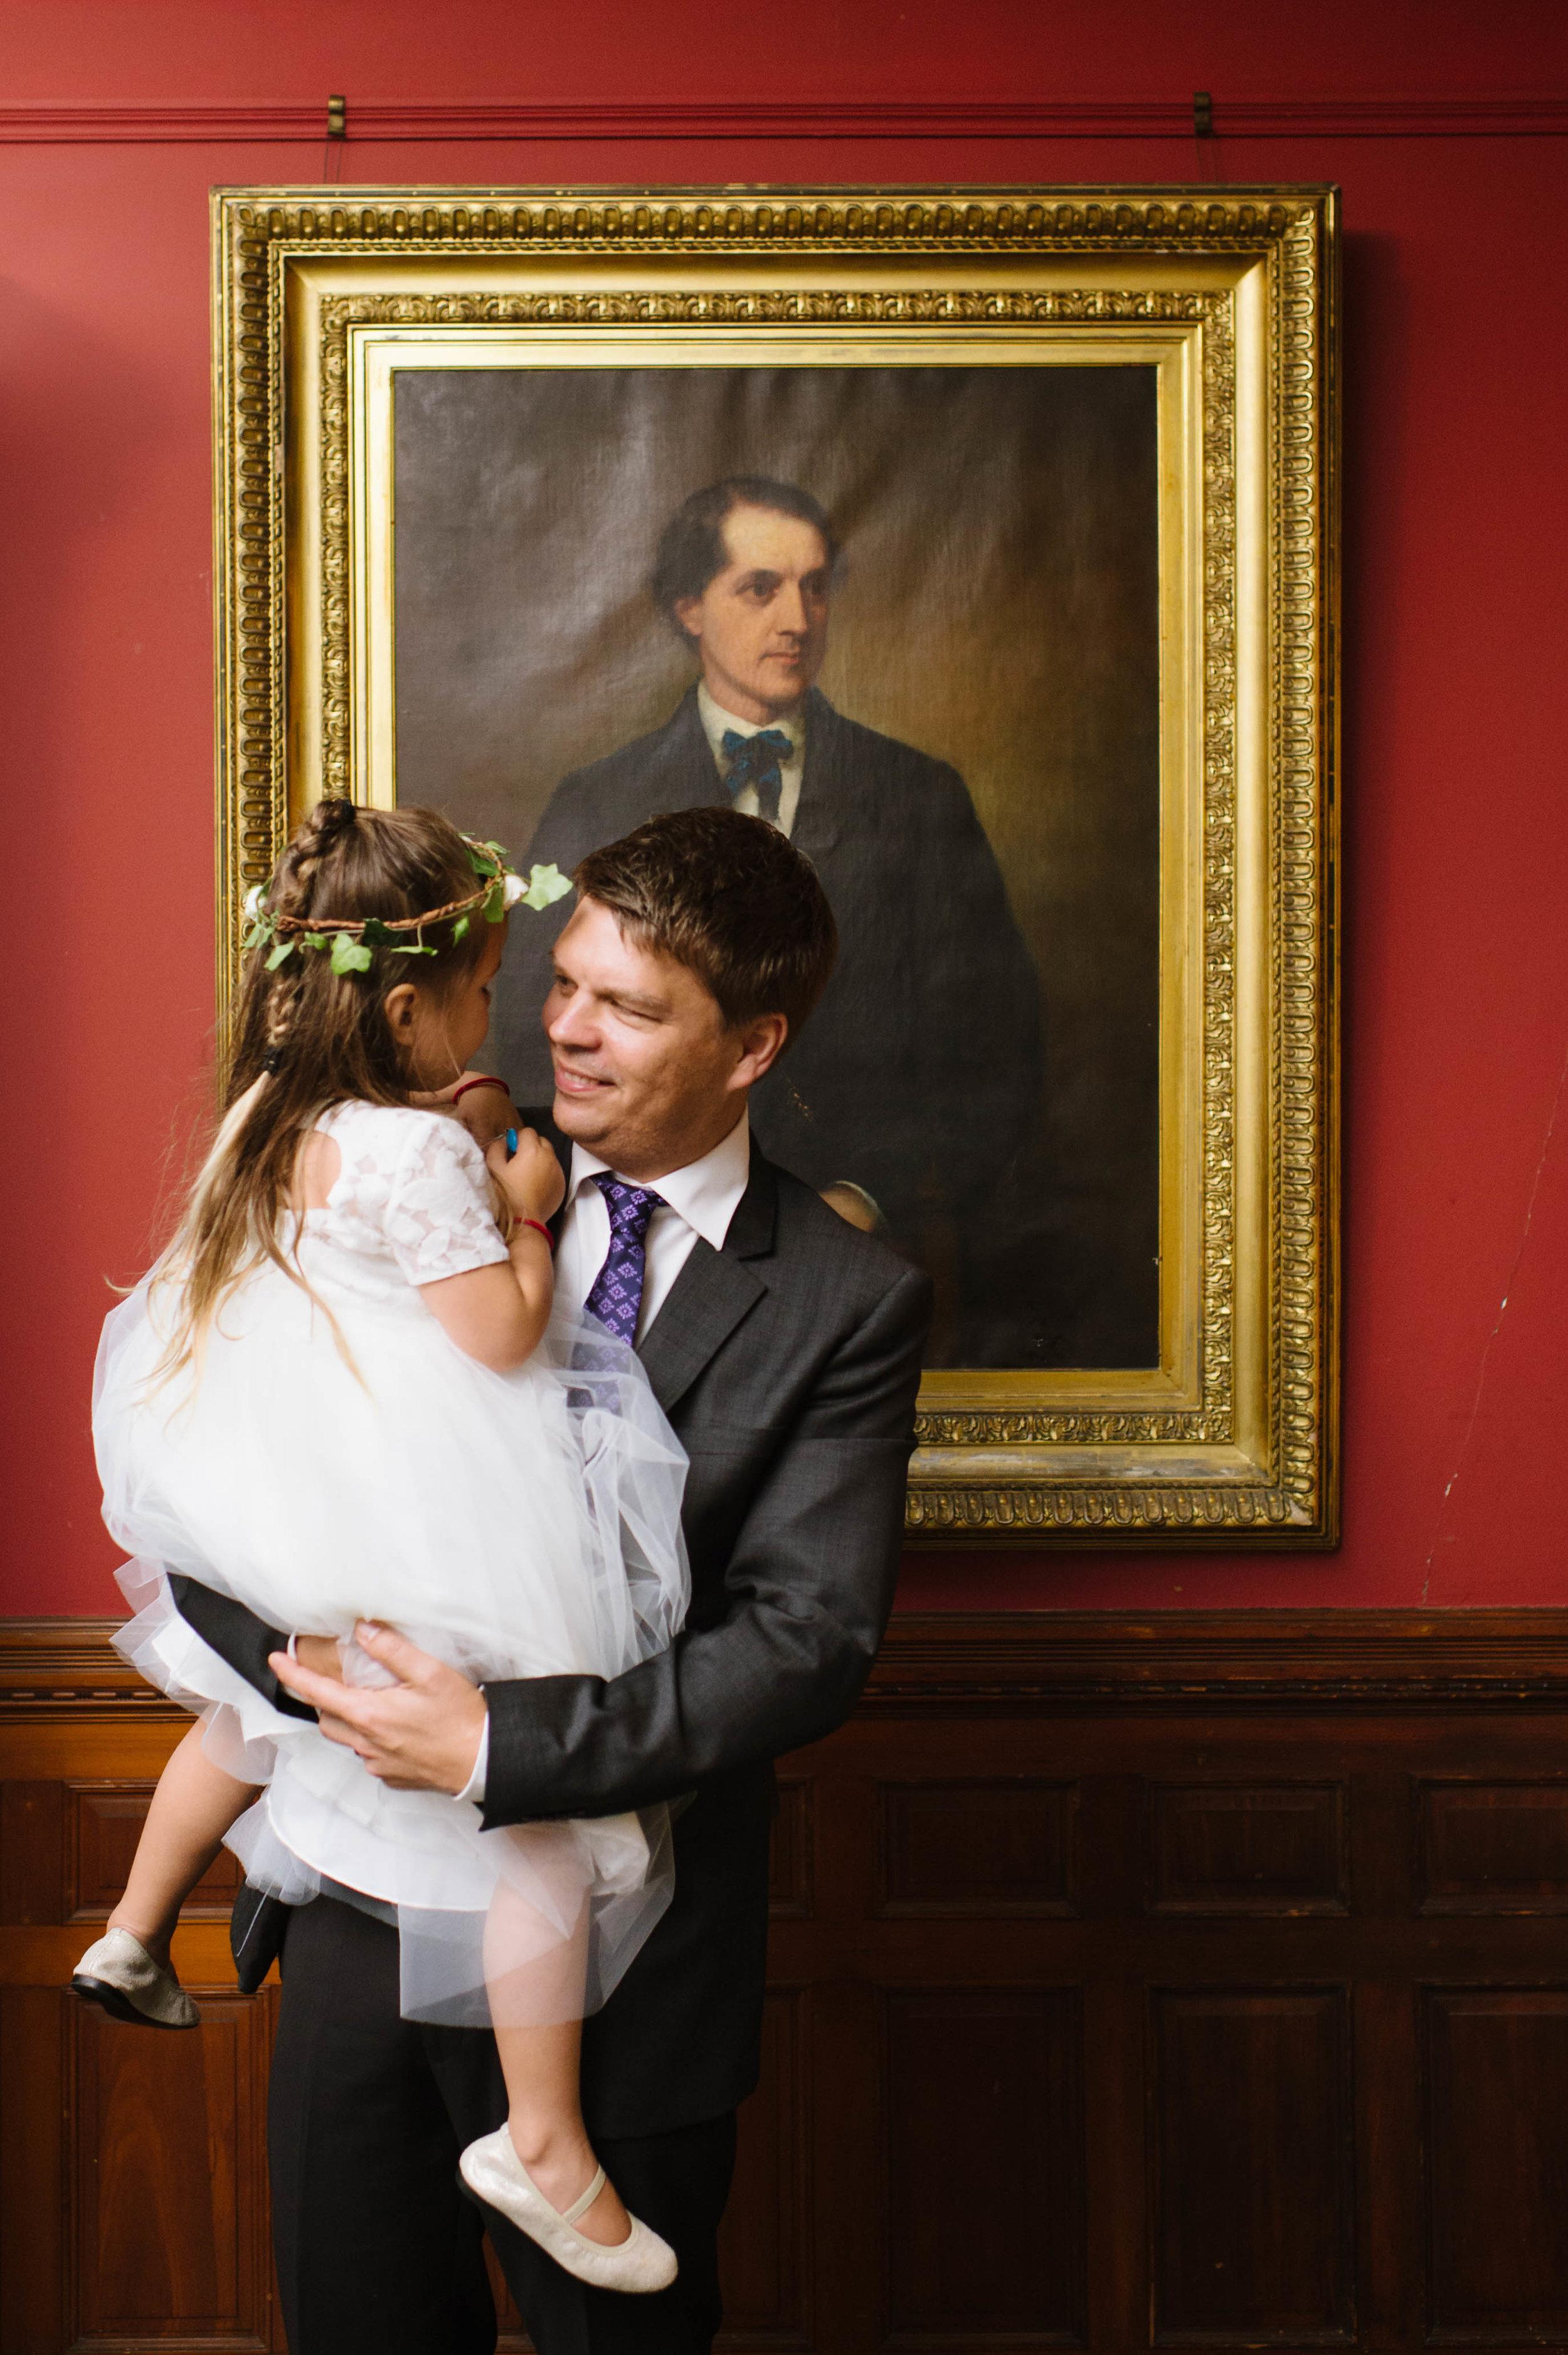 Creative-Wedding-Photography-Boston20.jpg